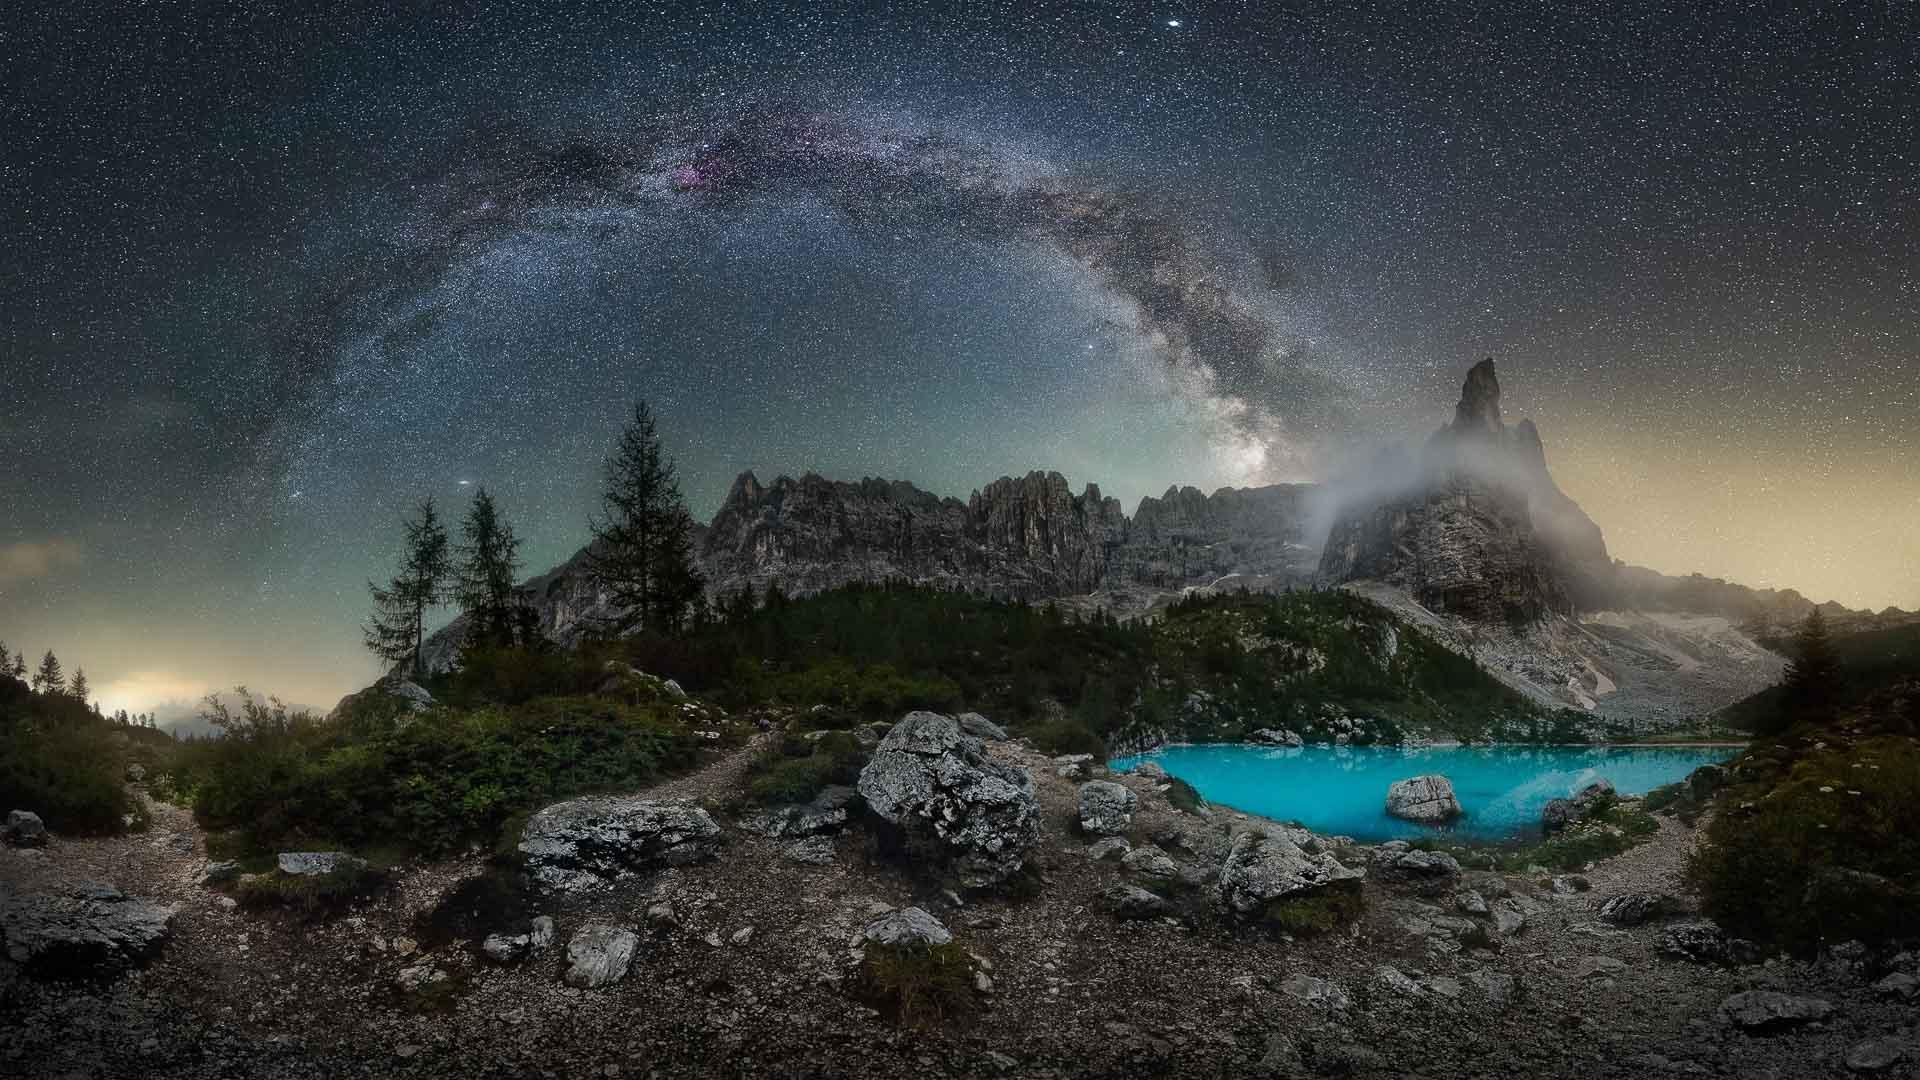 Milky Way over Sorapis Lake Dolomites Italy